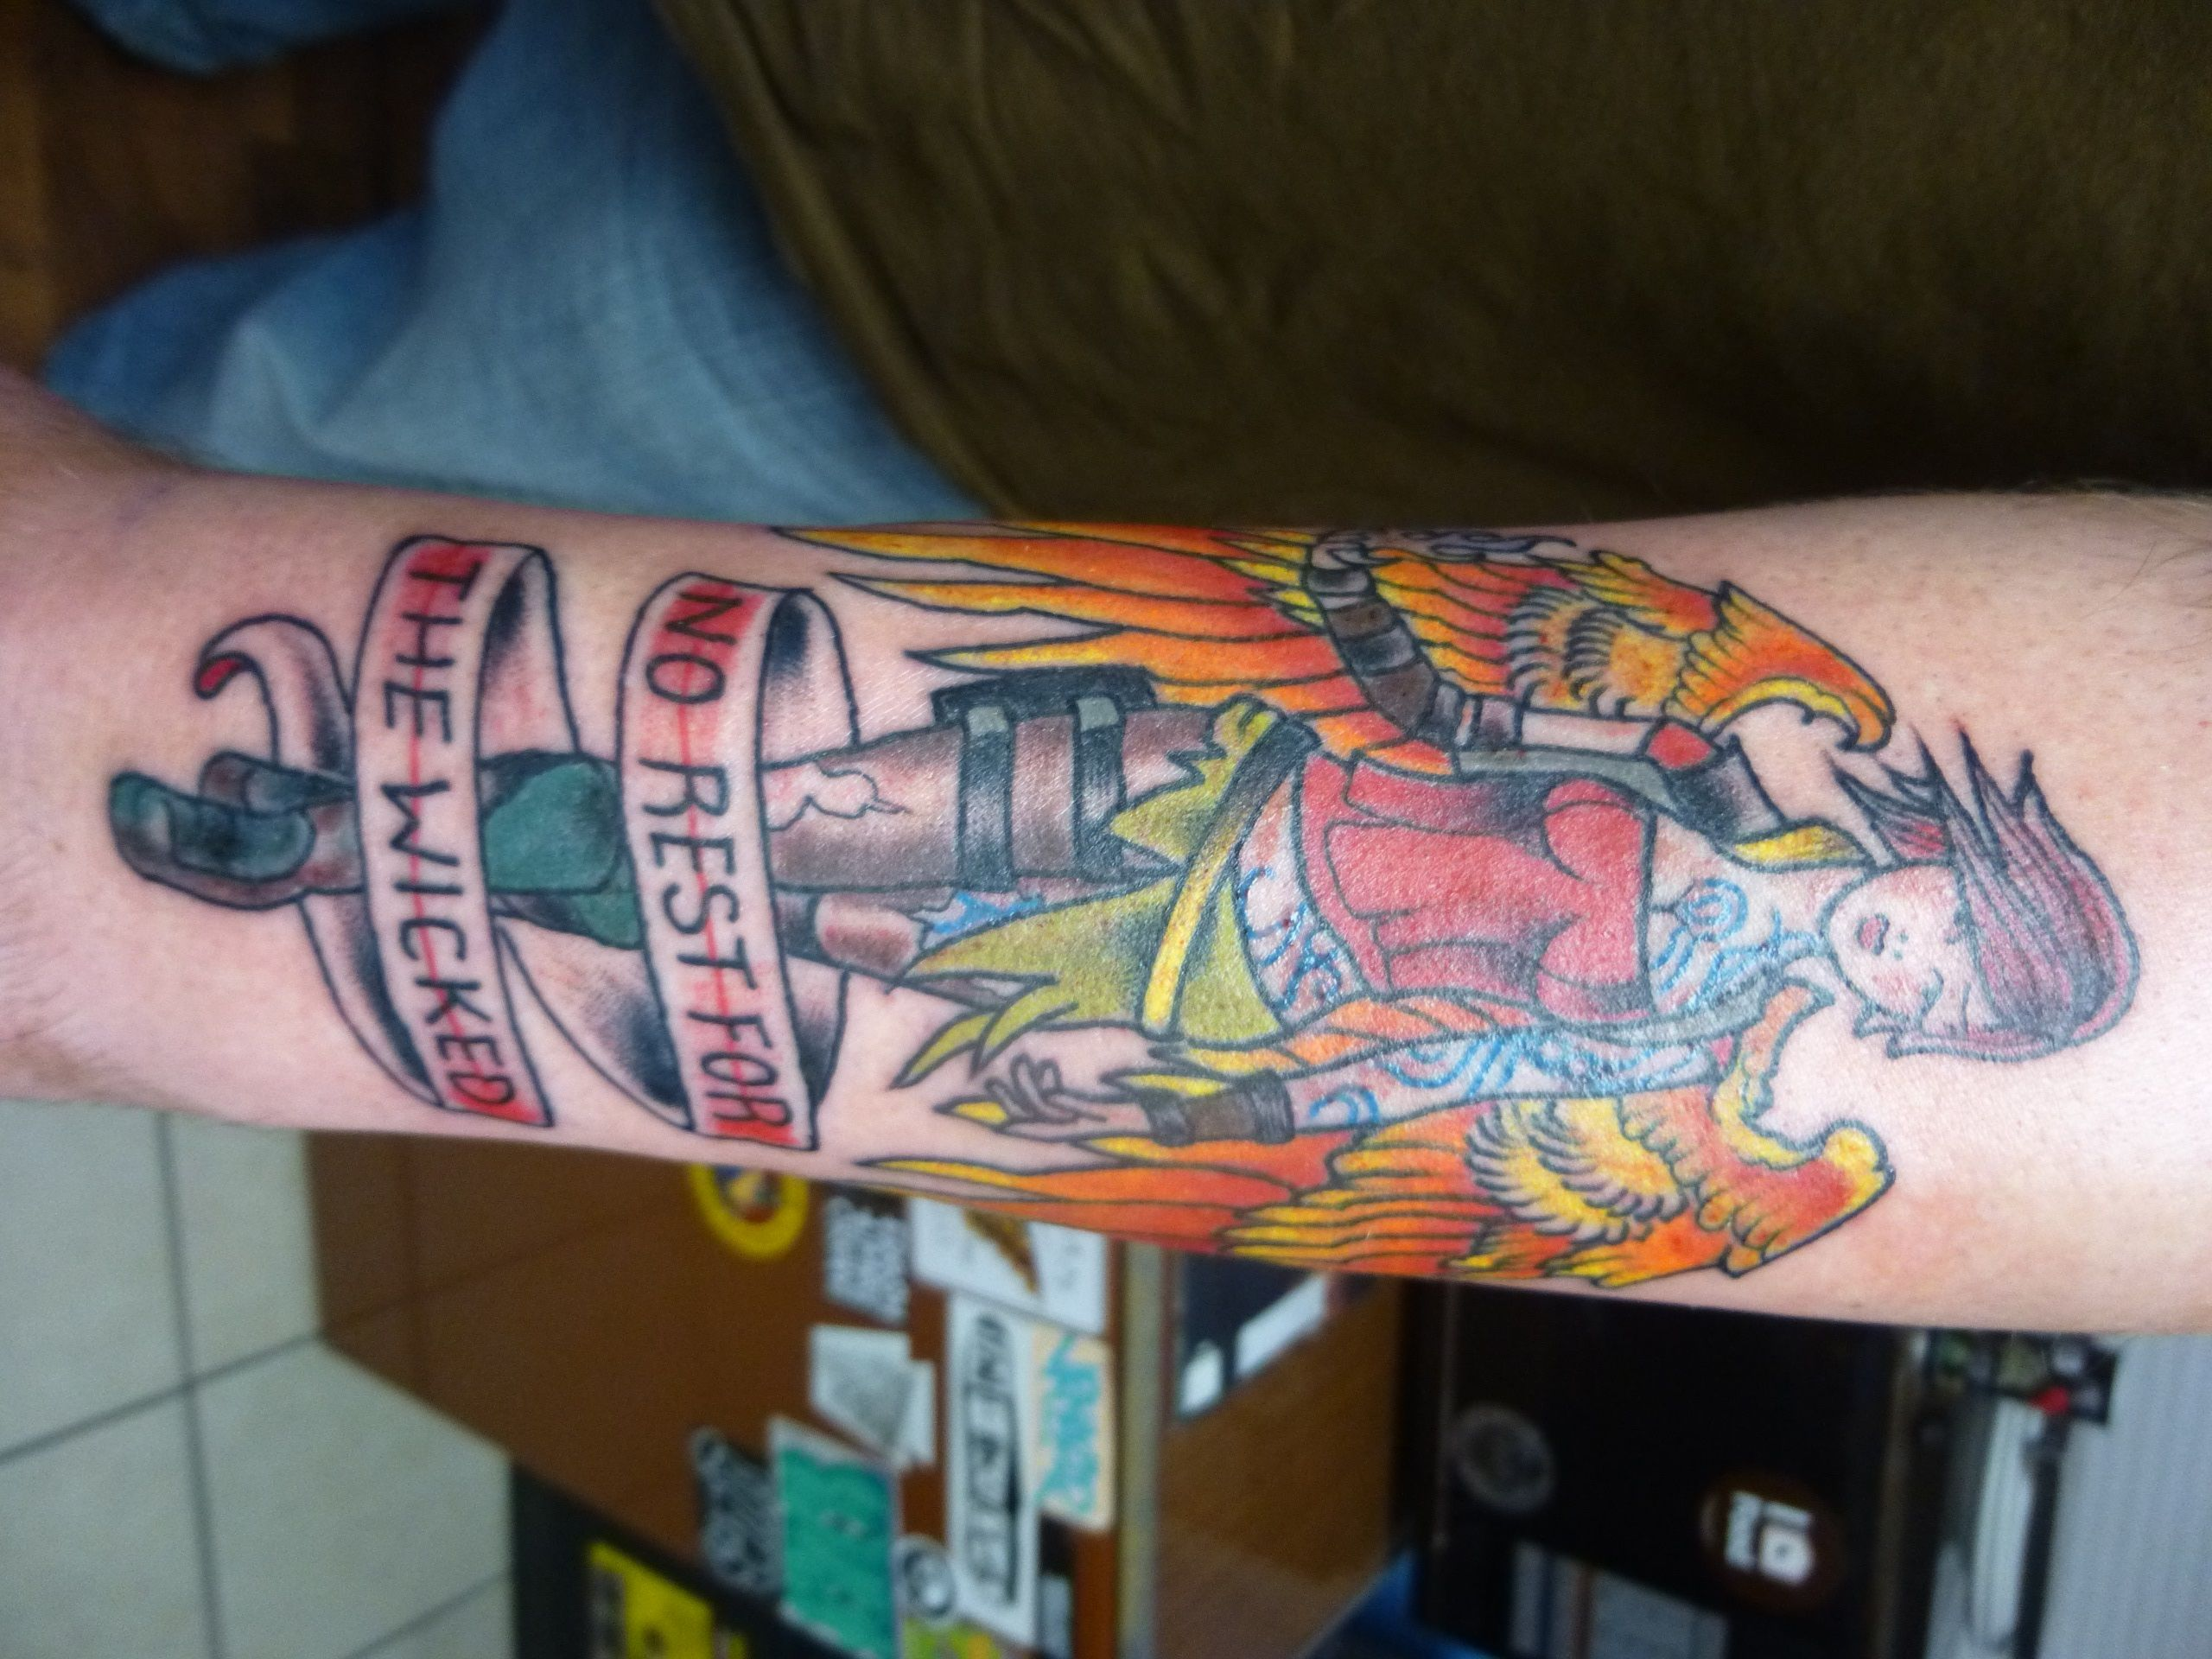 cult of the firehawk tattoo borderlands 2 tattoo ideas pinterest borderlands tattoo and. Black Bedroom Furniture Sets. Home Design Ideas